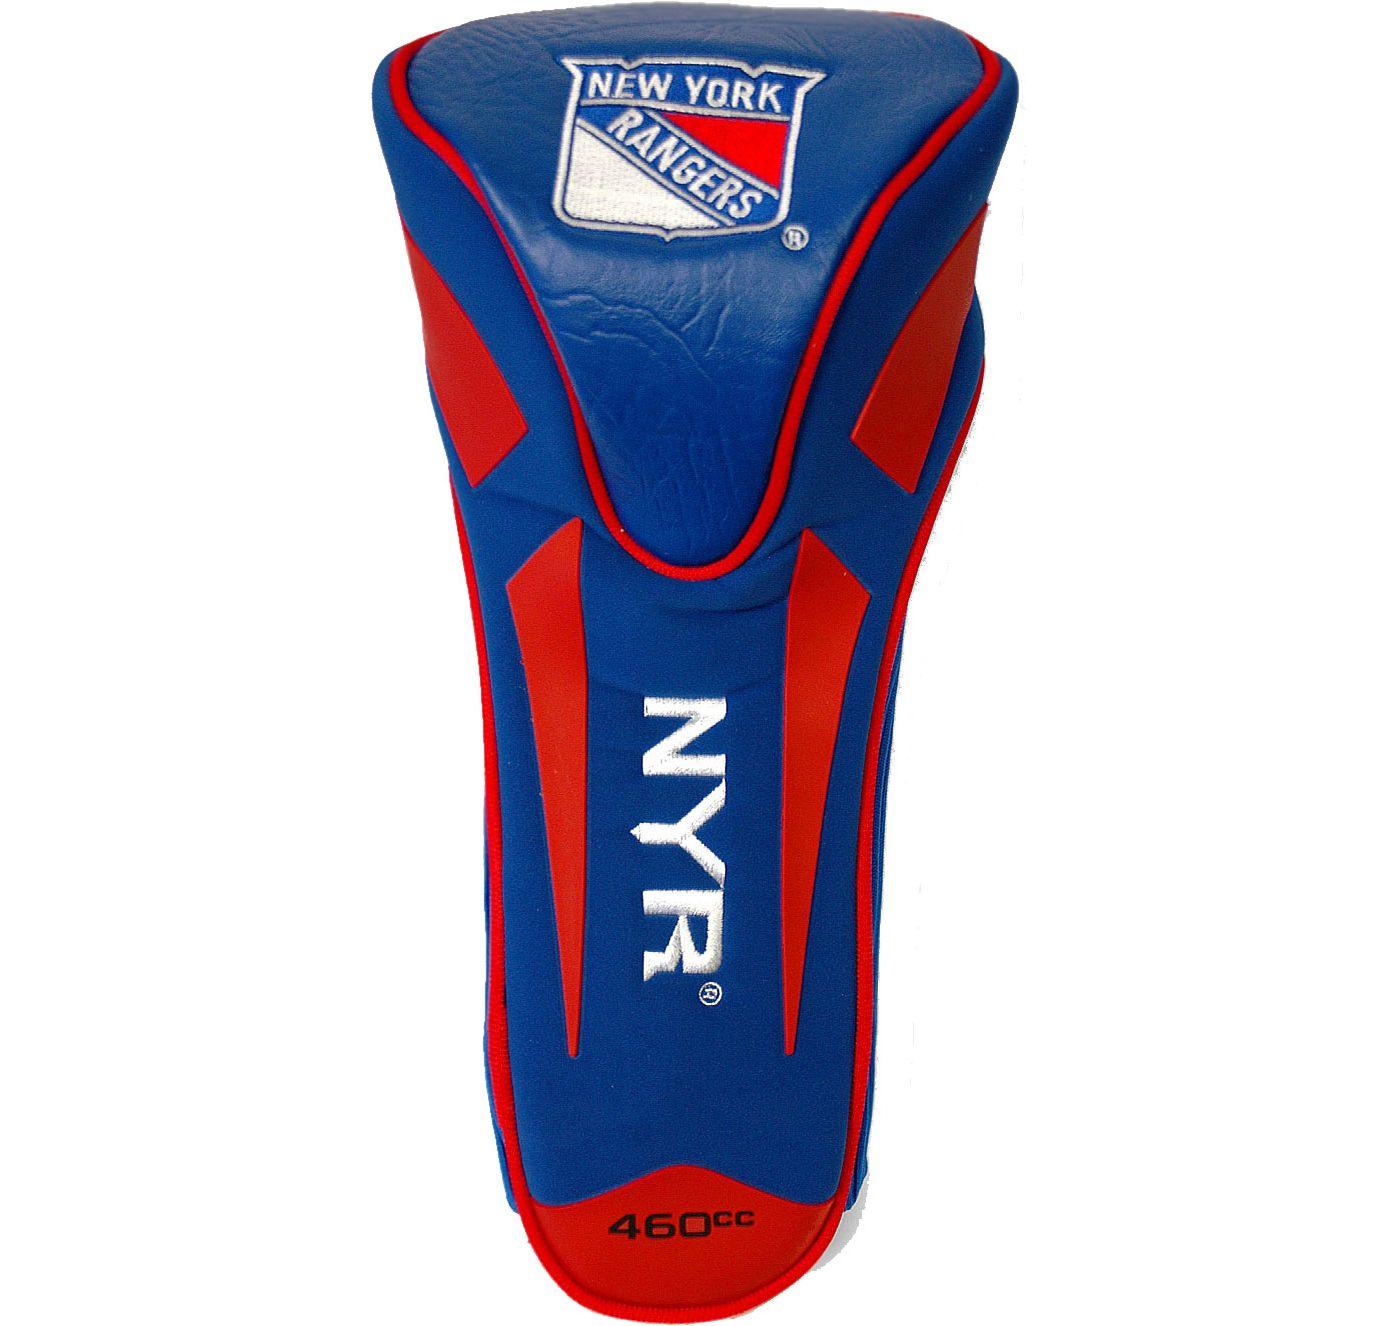 Team Golf APEX New York Rangers Headcover